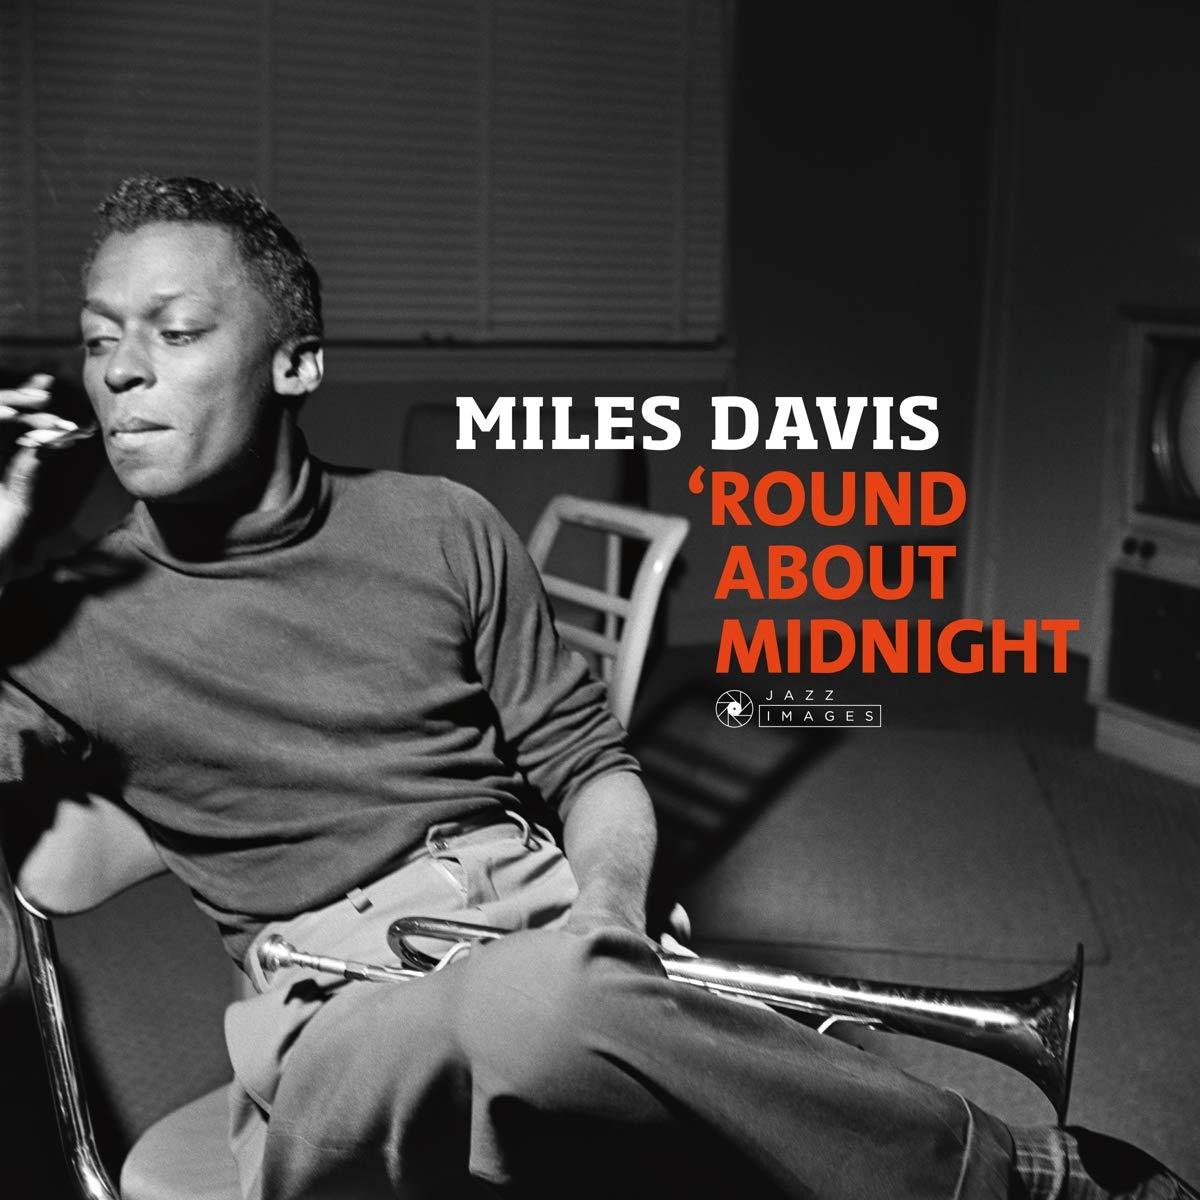 'Round About Midnight (FRANCIS WOLF COLLECTION) 180gram Vinyl [VINYL]